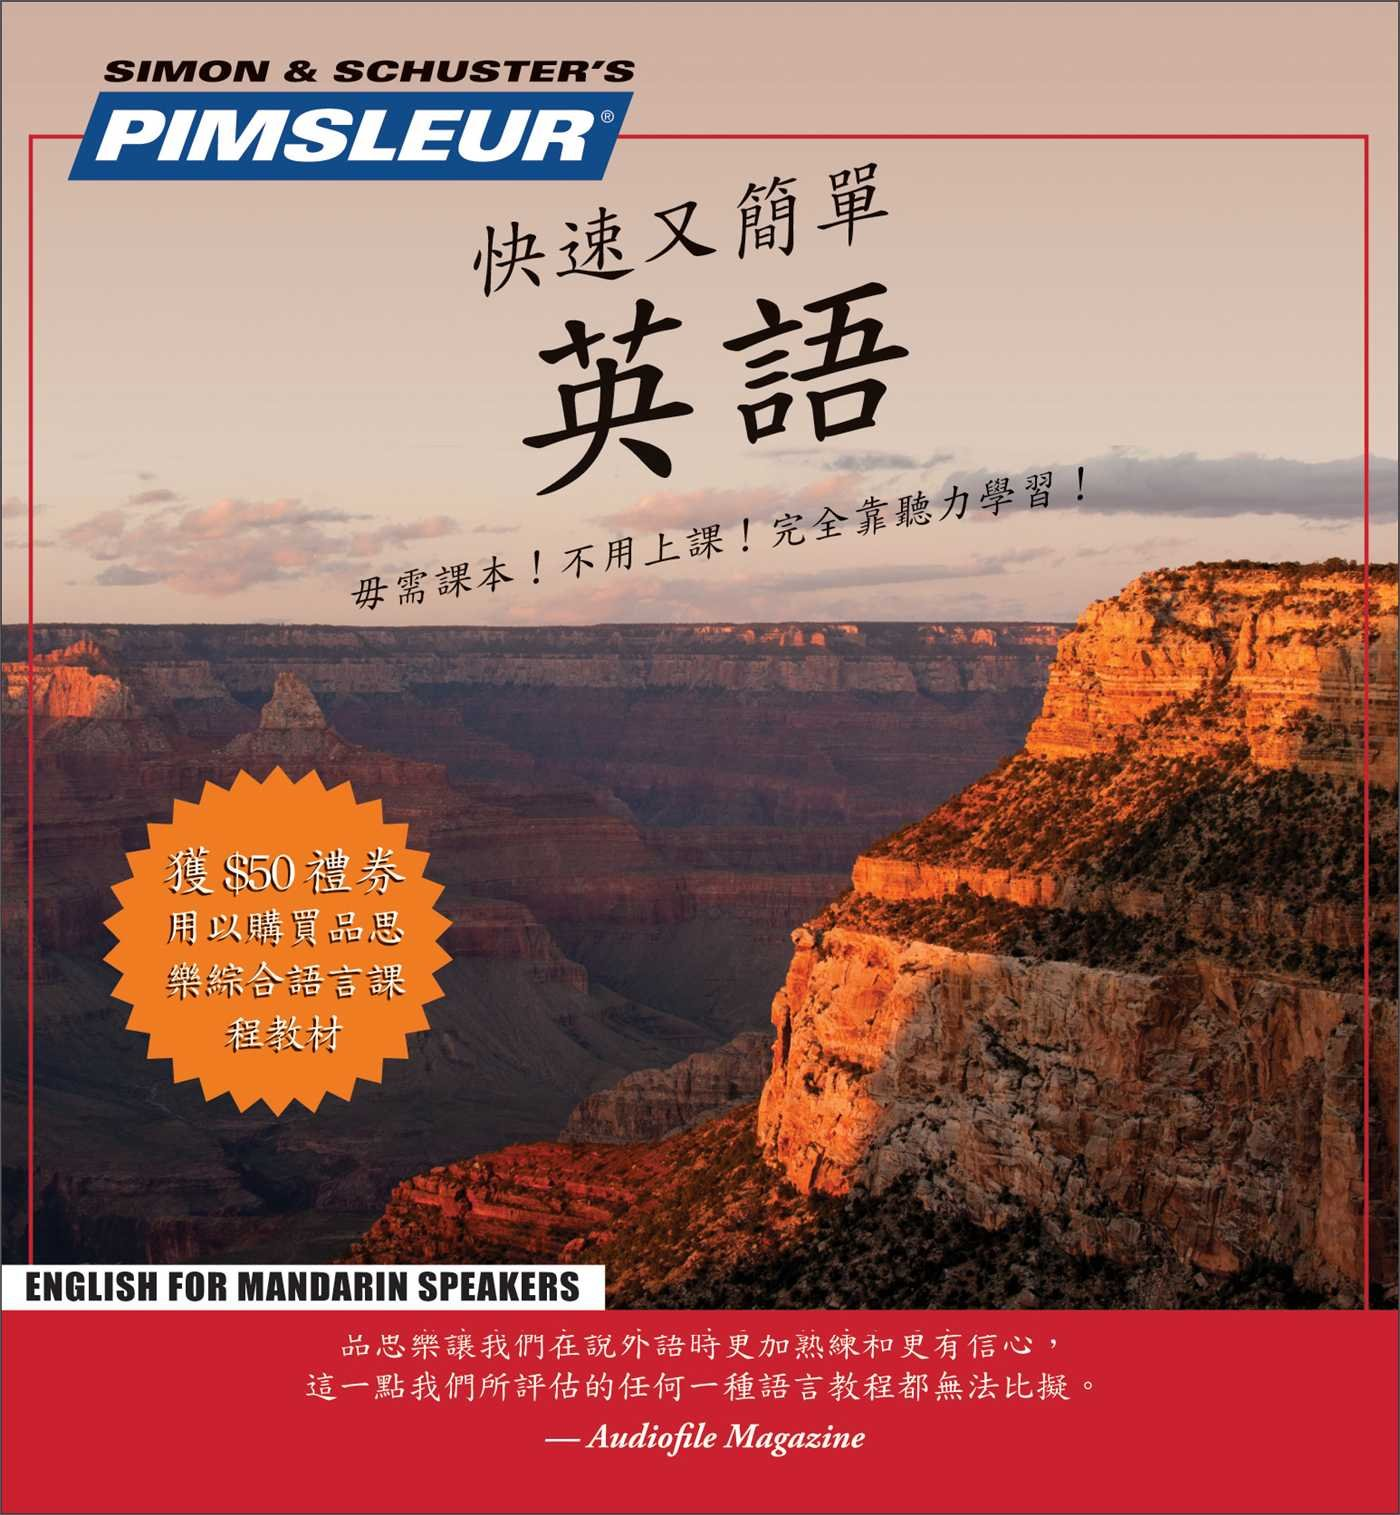 Pimsleur English Chinese Mandarin Speakers product image